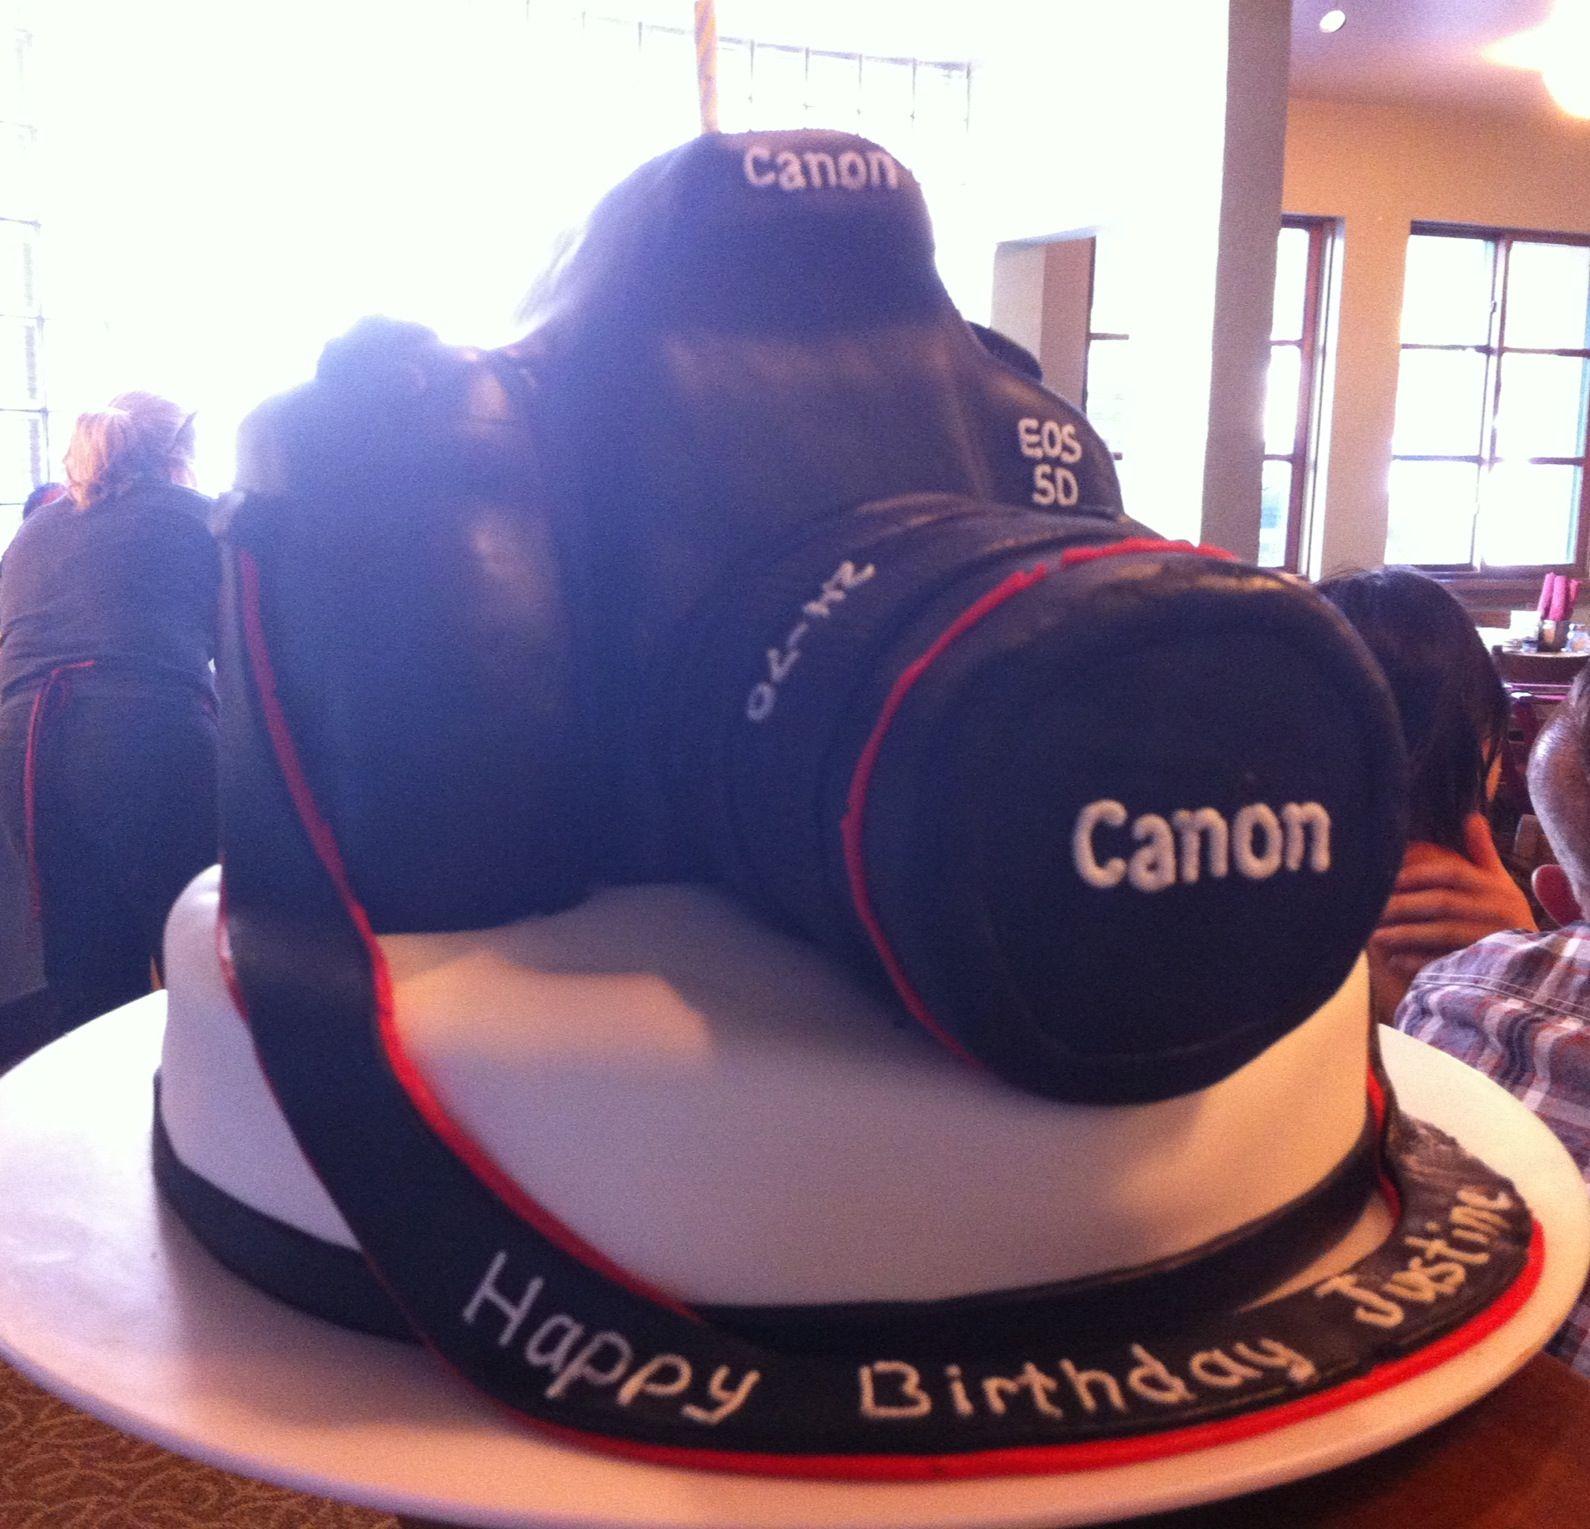 Amazing camera birthday cake. recipes :: cakes Pinterest